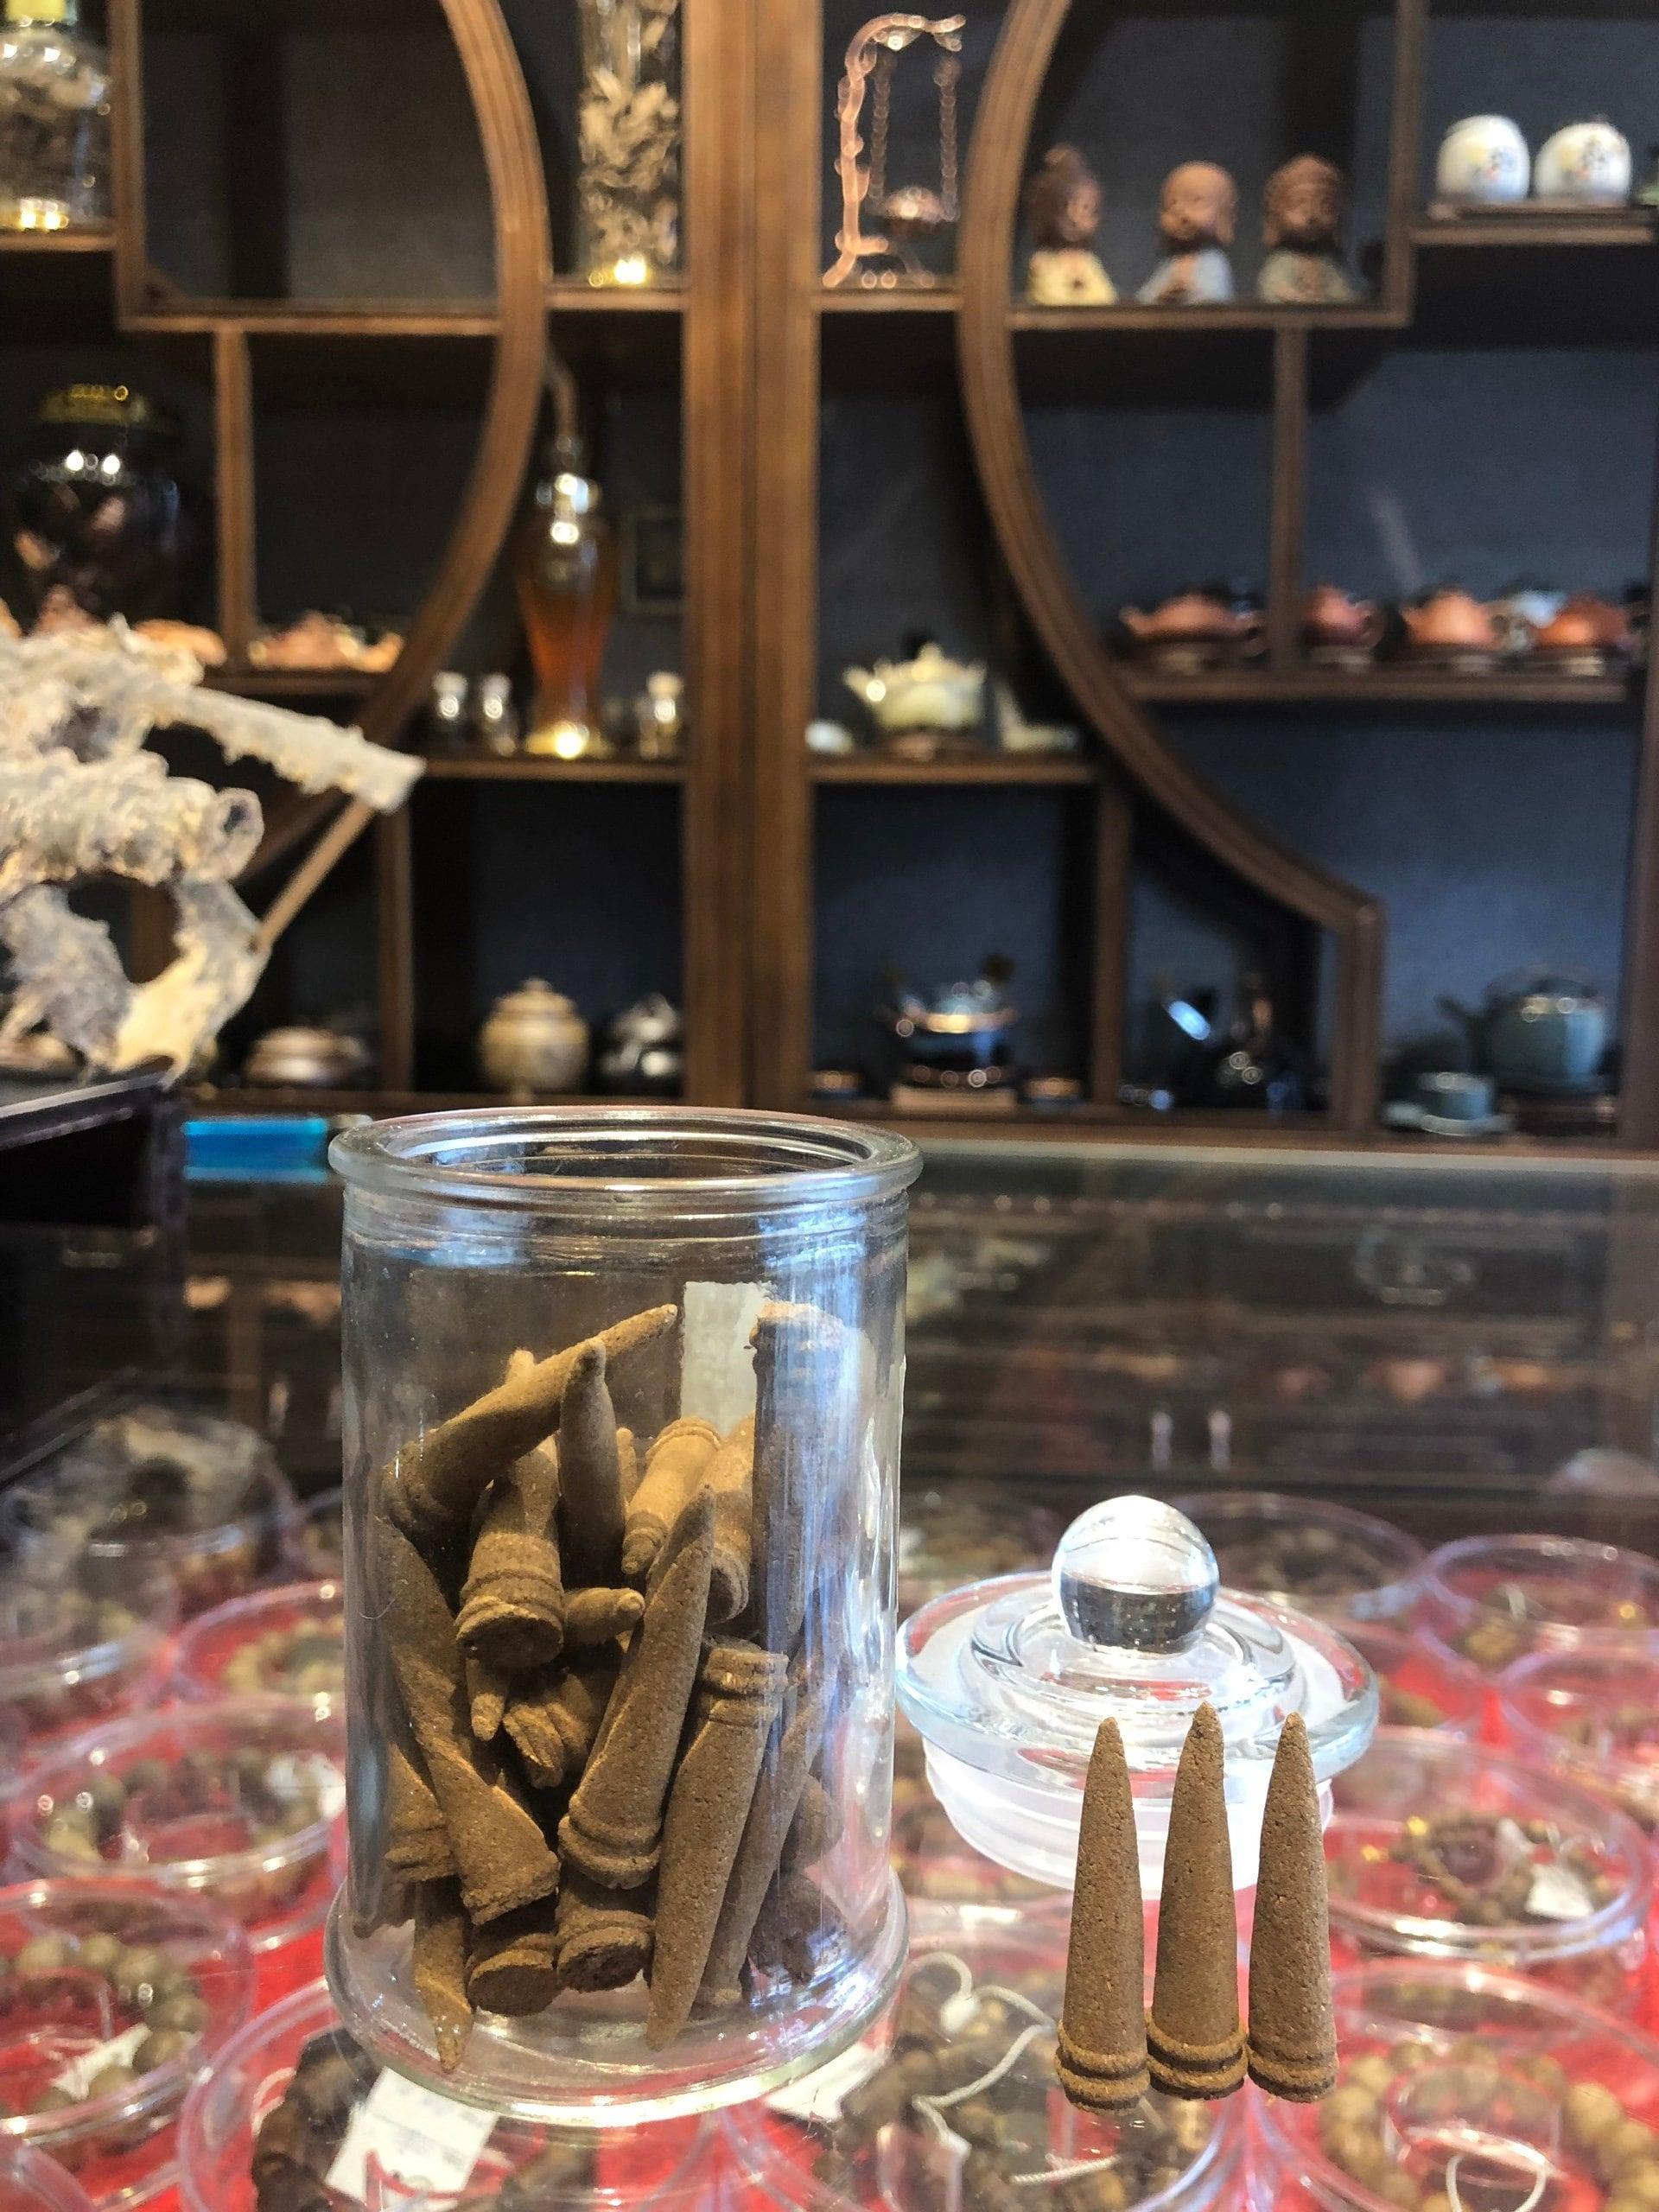 Incense cones, Agarwood incense, Oud incense, Feng shui incense, Yoga  incense, Buddhism incense, Meditation incense